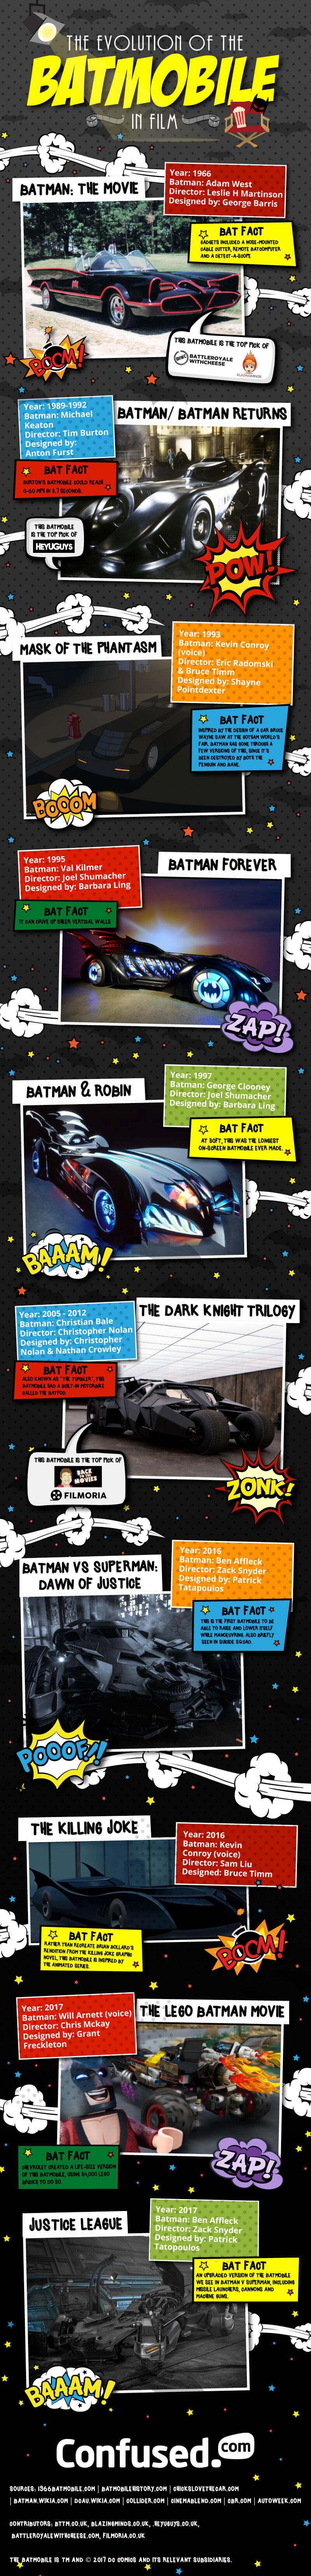 The Evolution of the Batmobile in Film